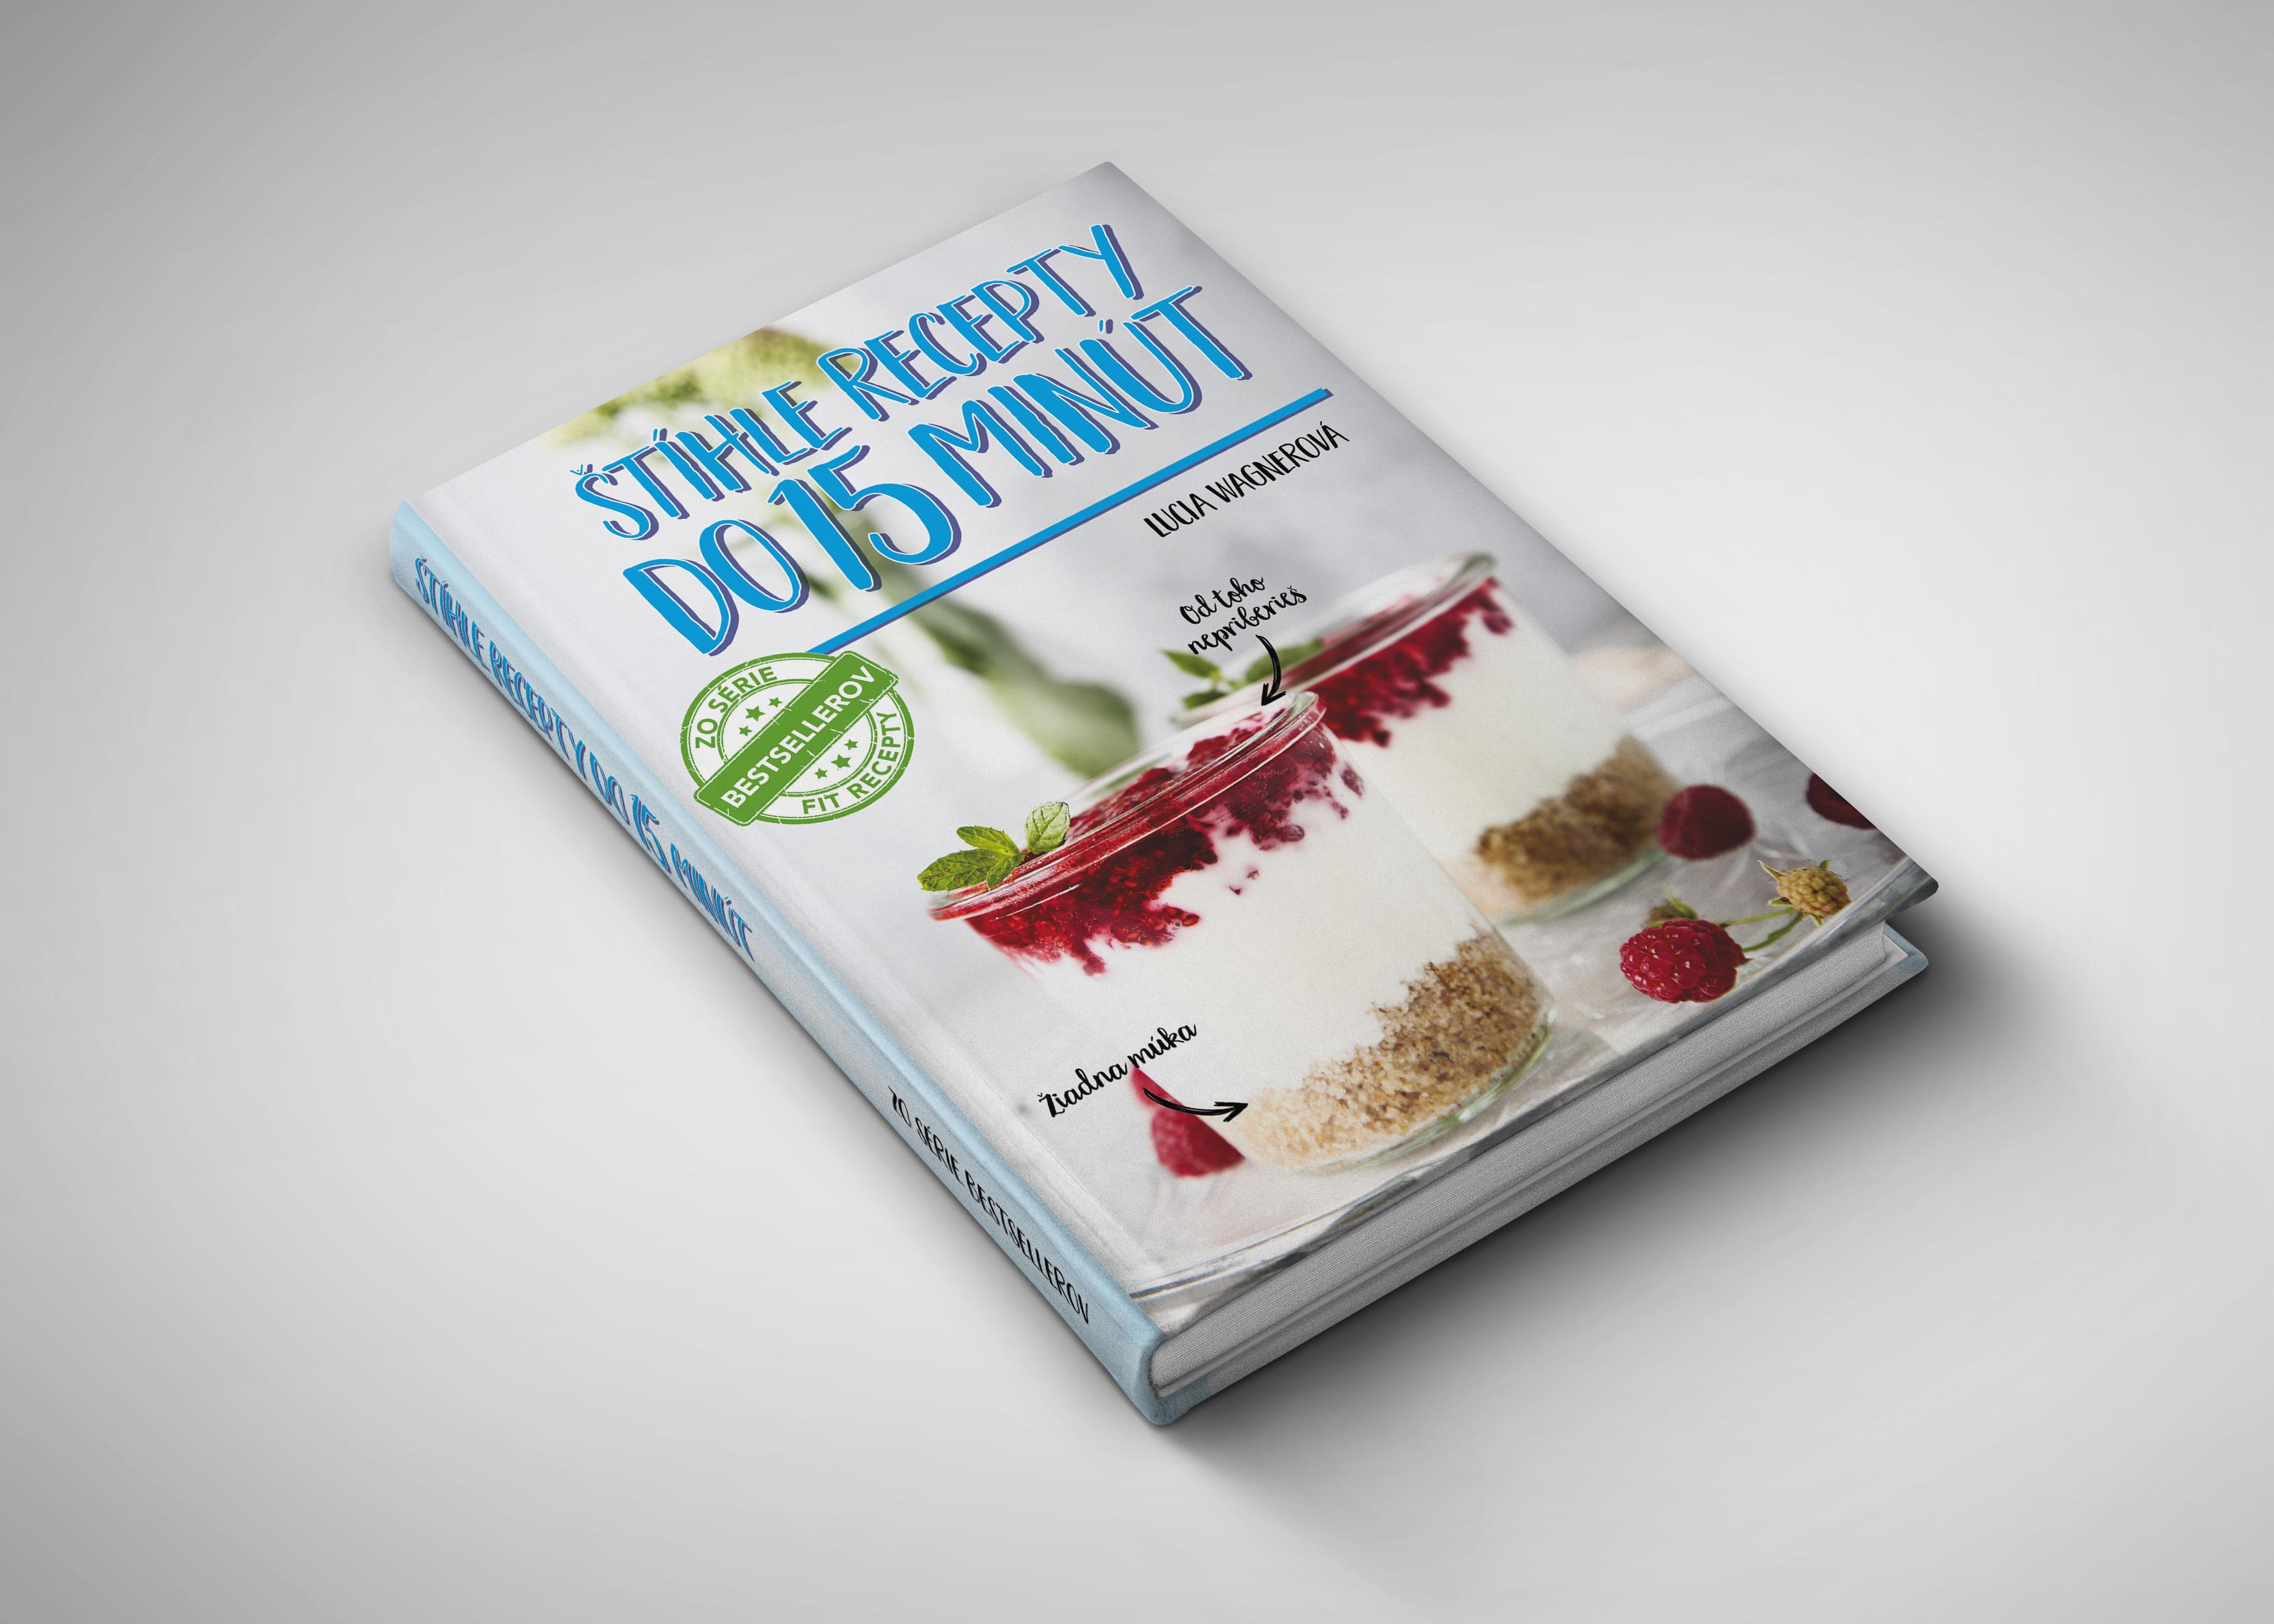 stihle recepty kniha